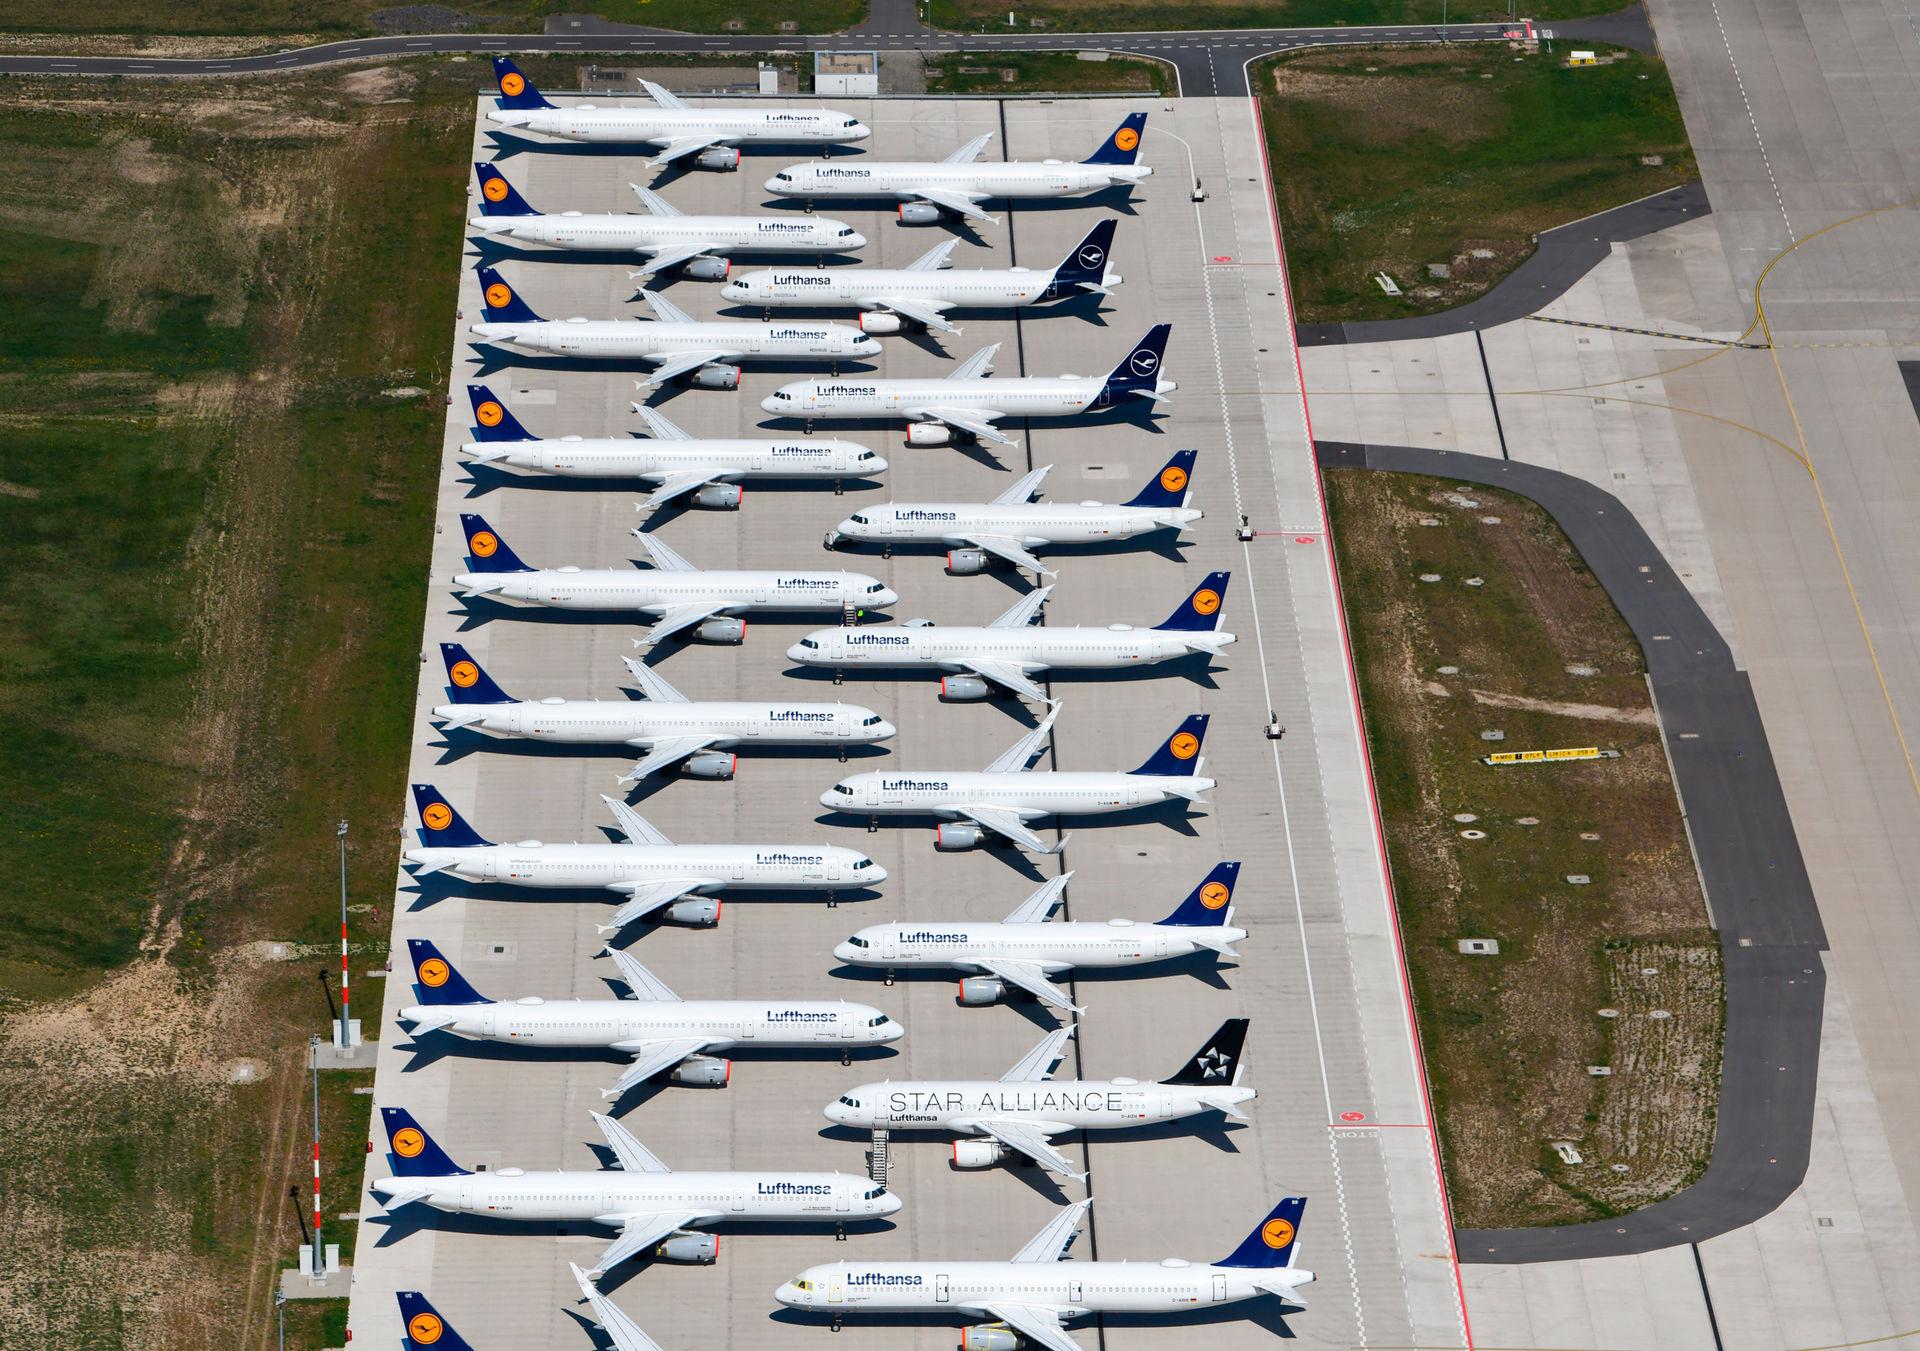 aviones-aparcados-aeropuerto-berlin-brandenburg-international-airport-schoenefeld-2.jpg